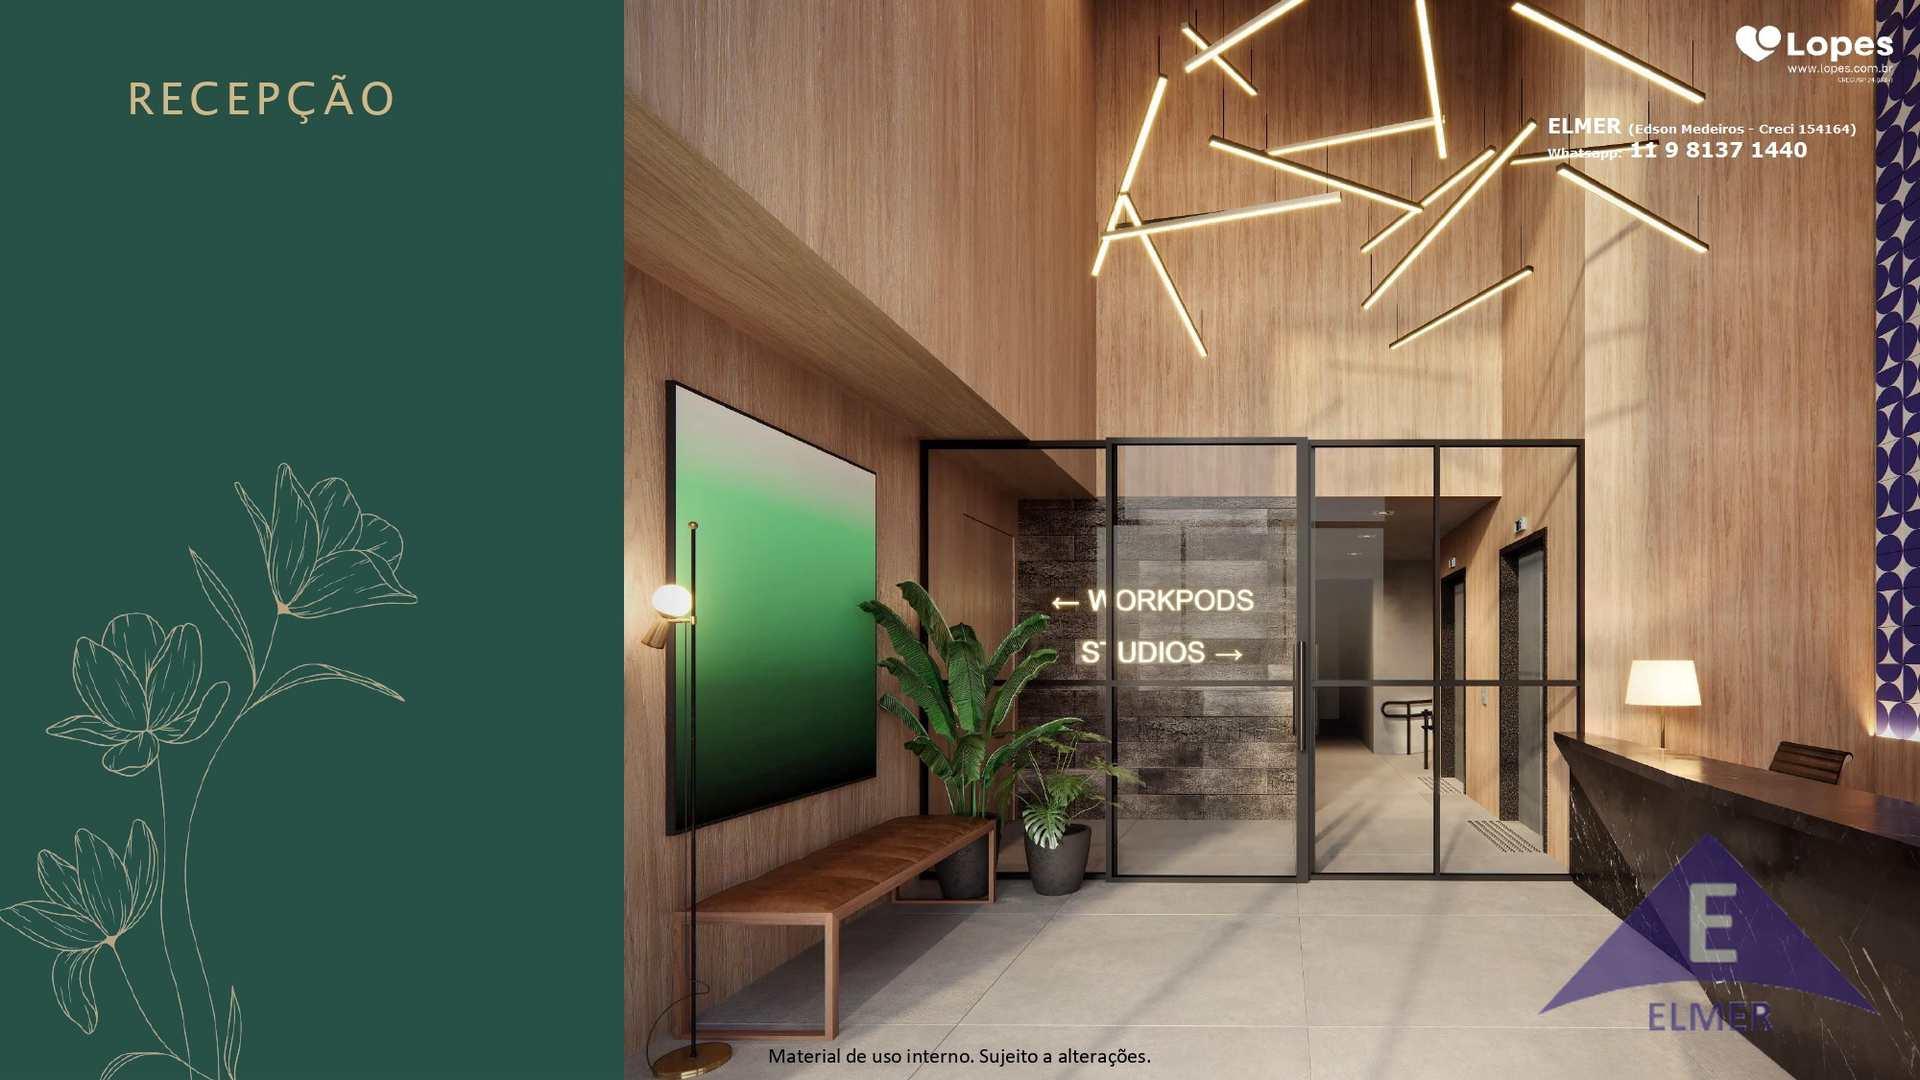 Hall Social Studios - Florear - Elmer